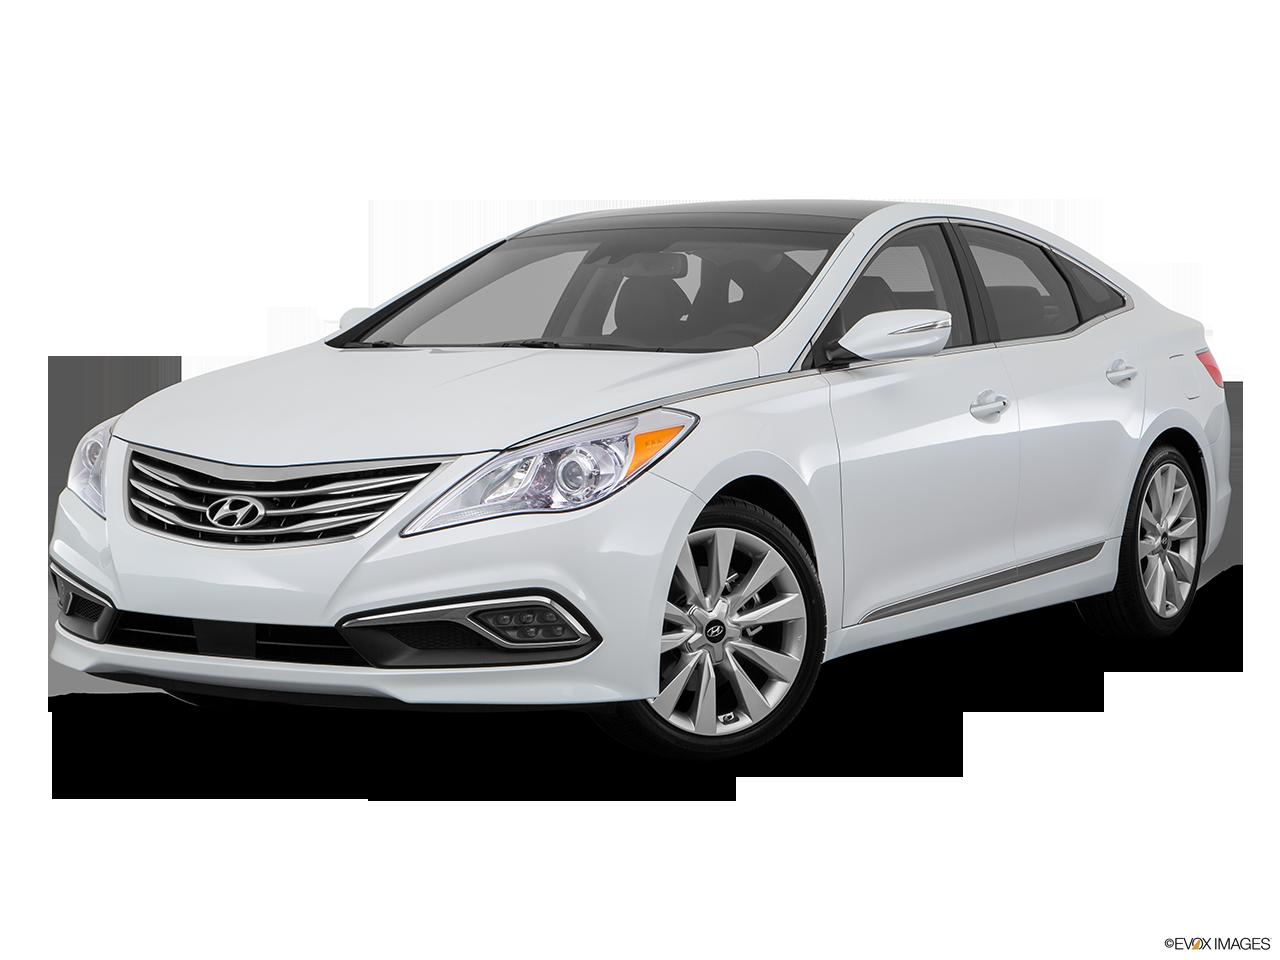 Test Drive A 2016 Hyundai Azera at Ontario Hyundai in Ontario